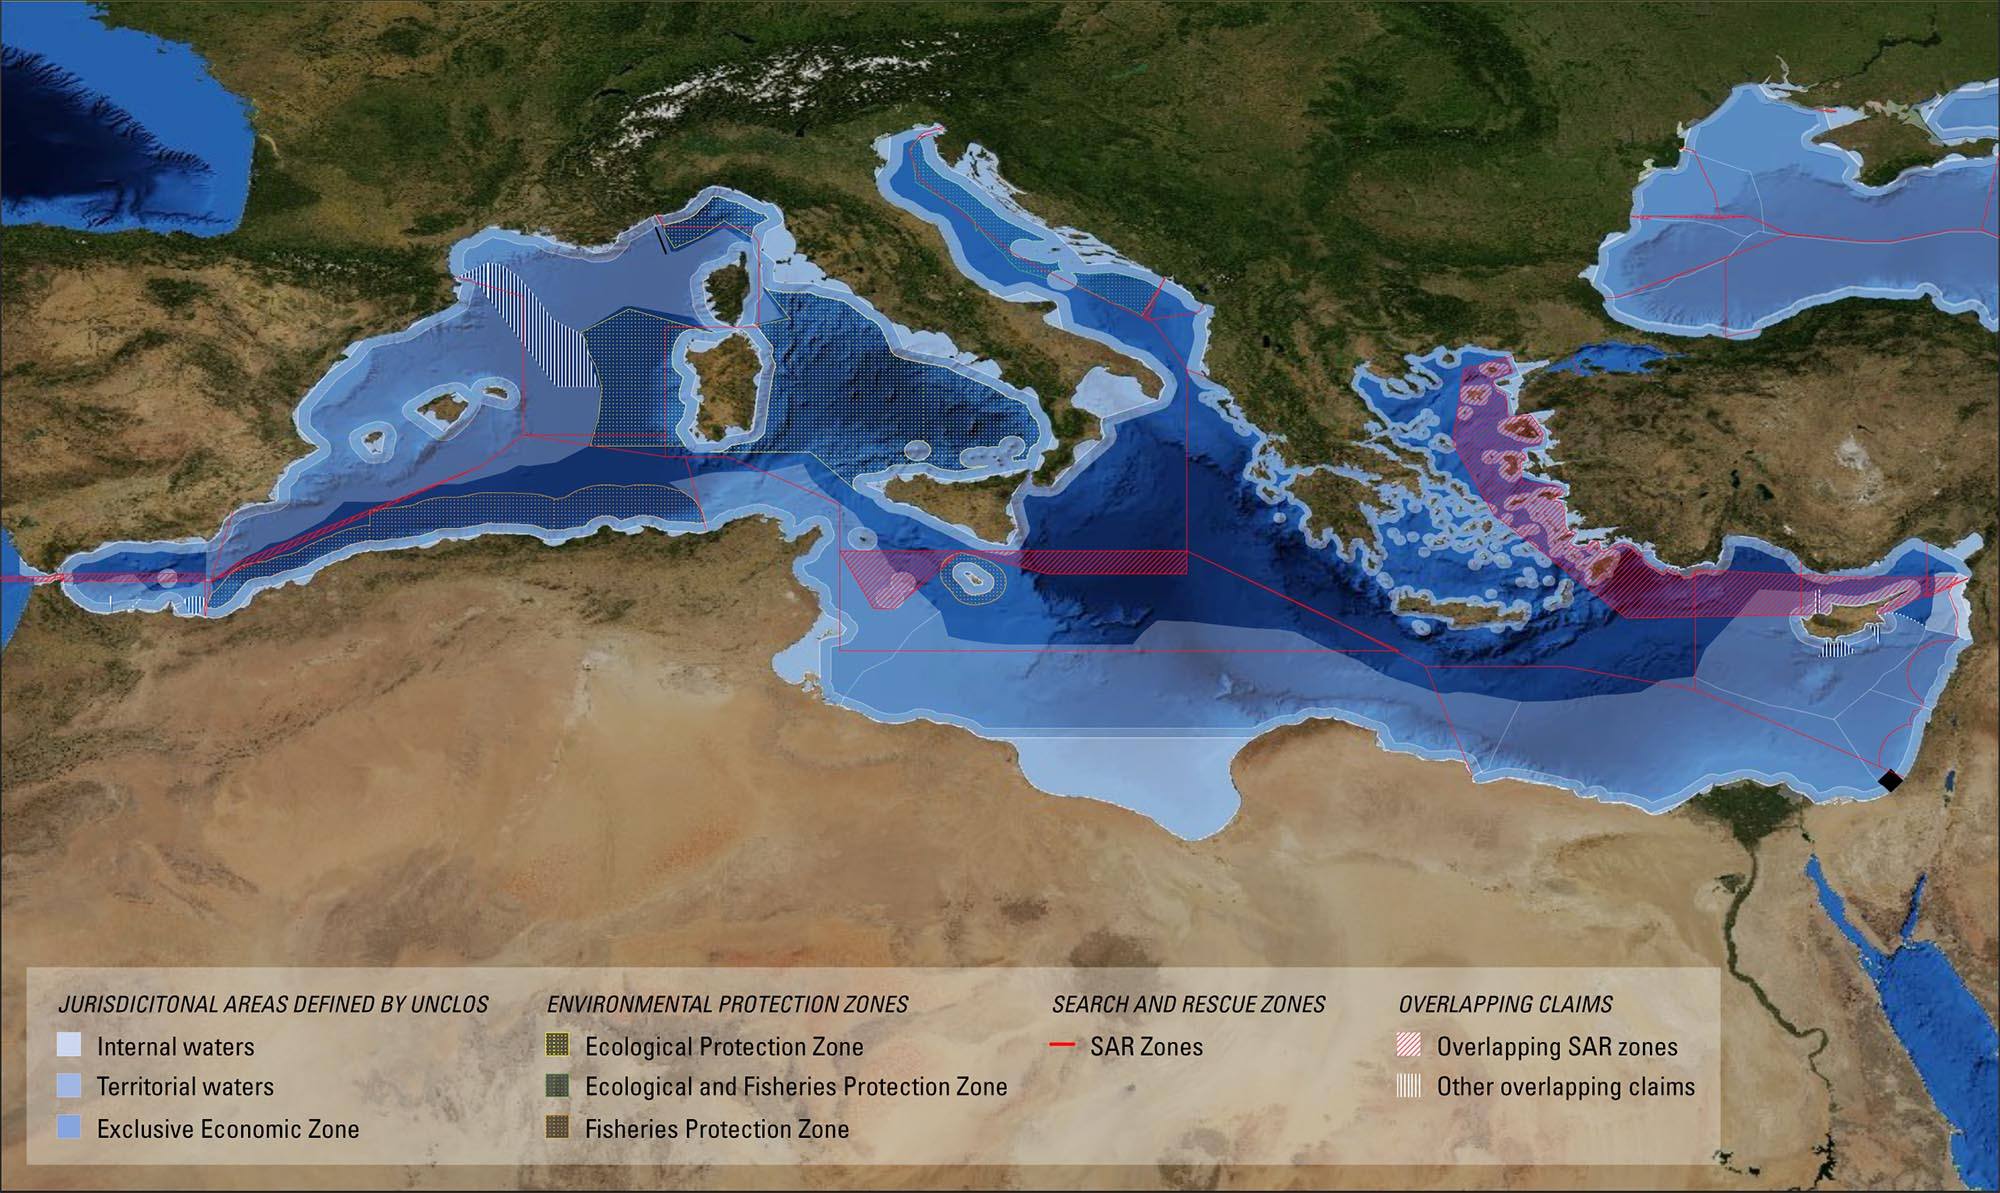 Maritime jurisdictions in the Mediterranean. (Forensic Oceanography)